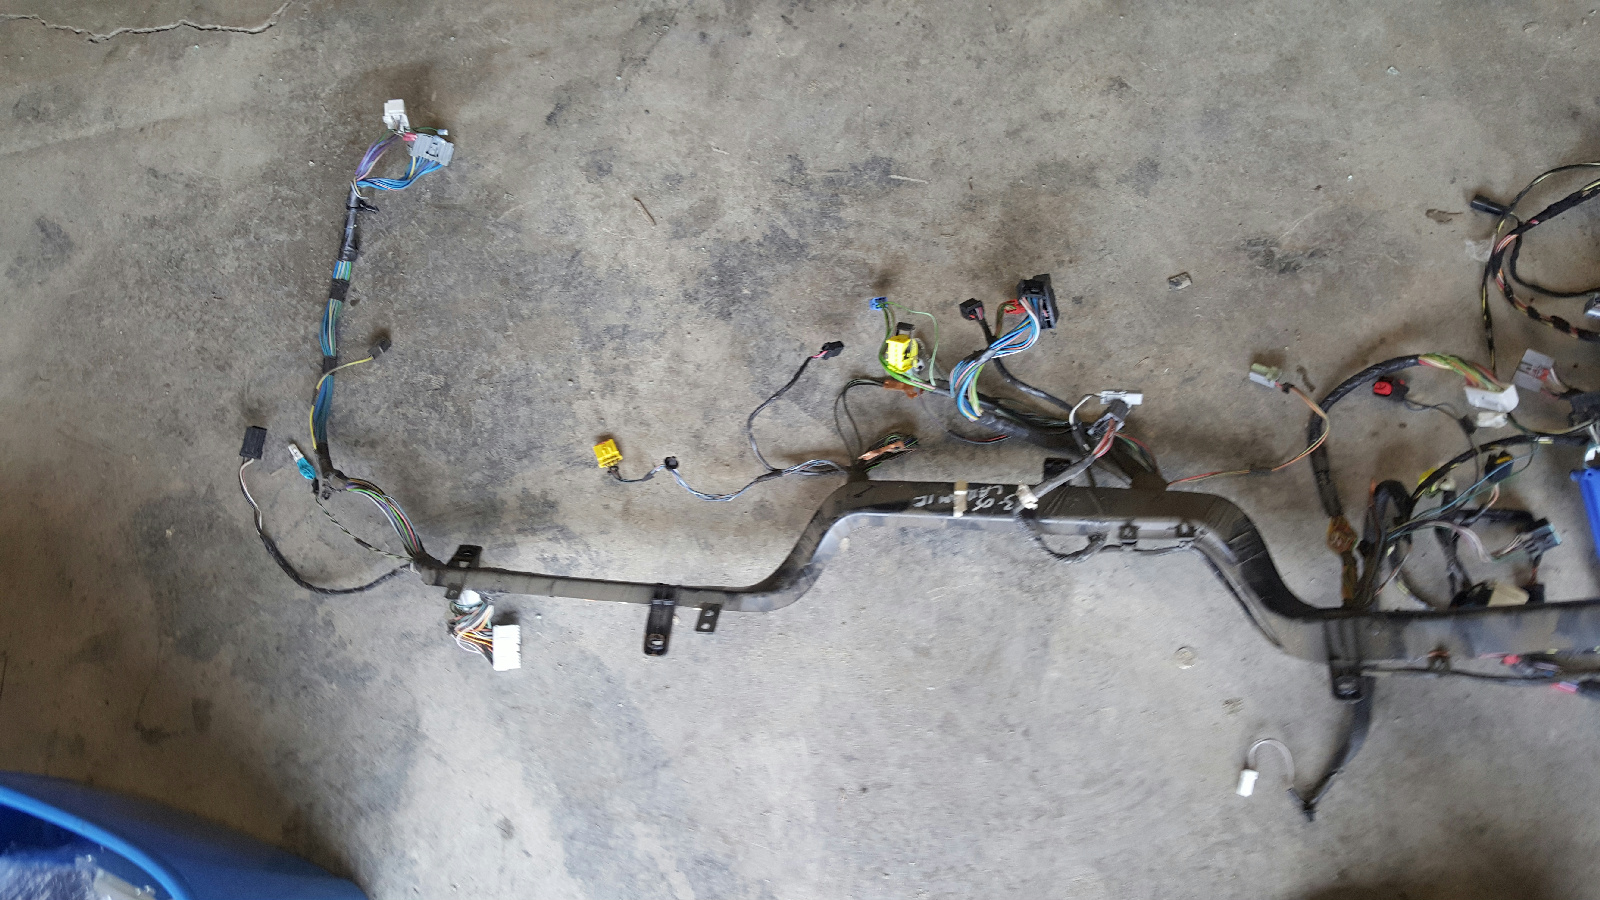 2003 Dodge 25003500 Cummins 59L diesel engine compartment wiring – Dodge Engine Compartment Wiring Harness